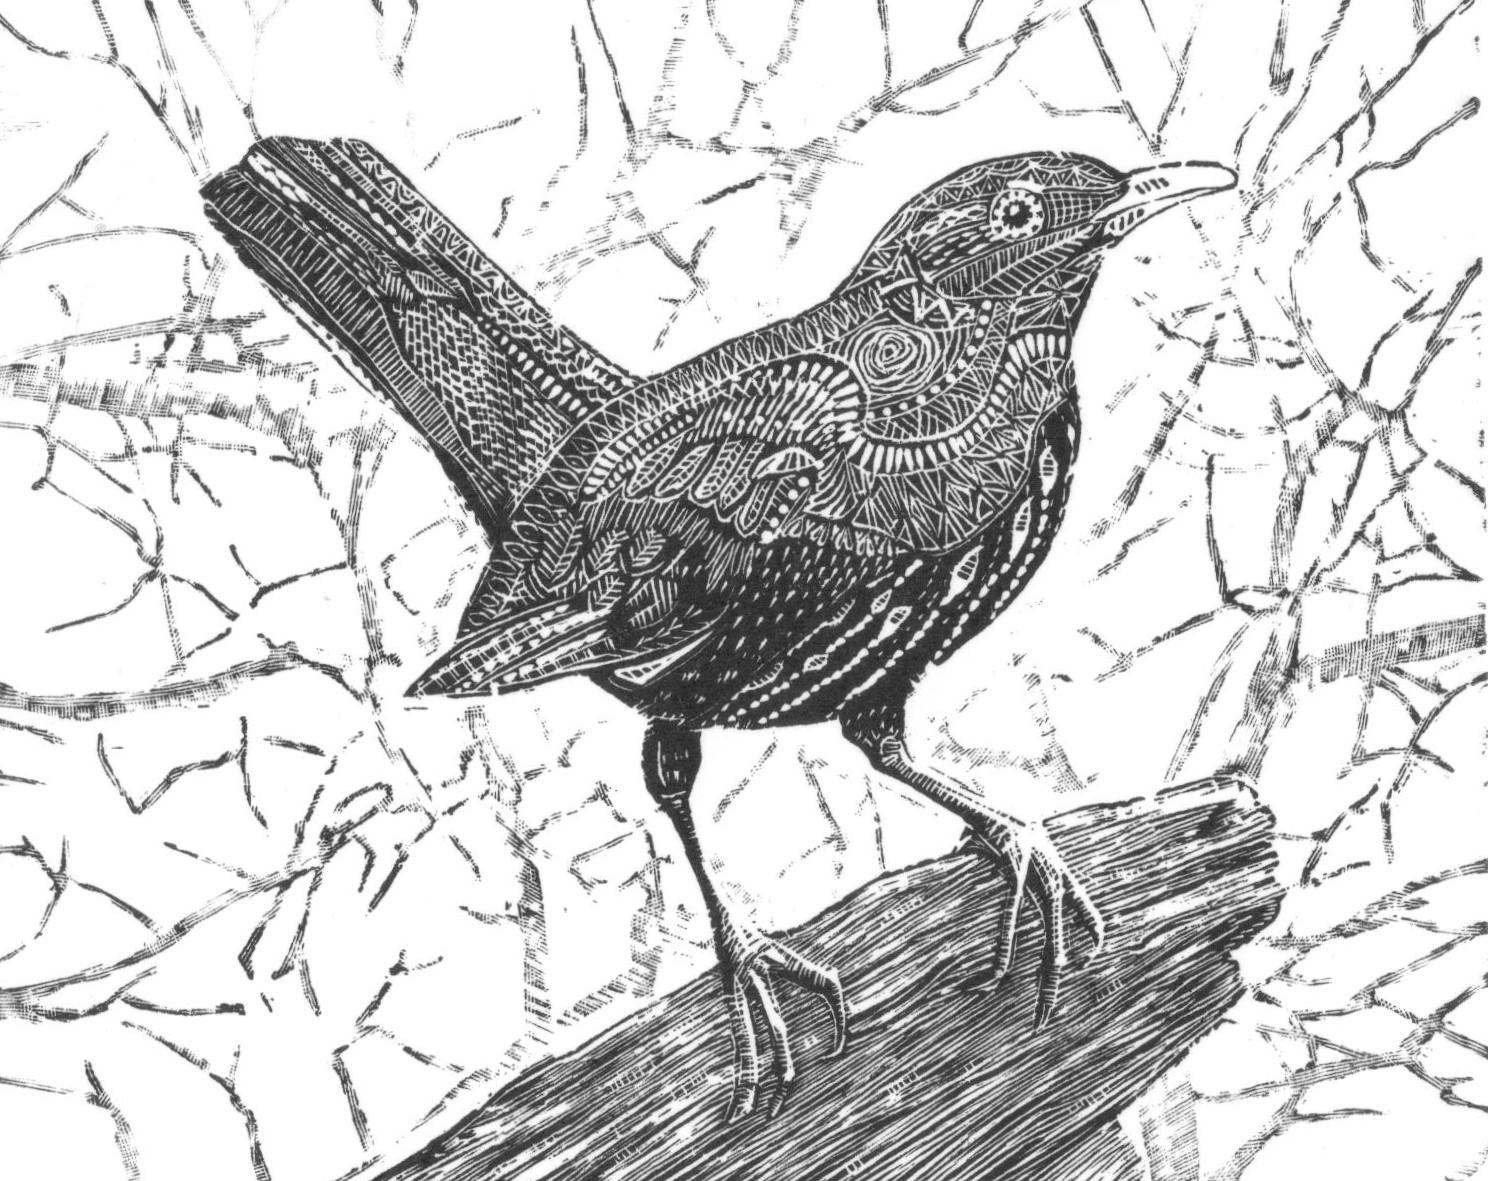 Bonnie Blackbird